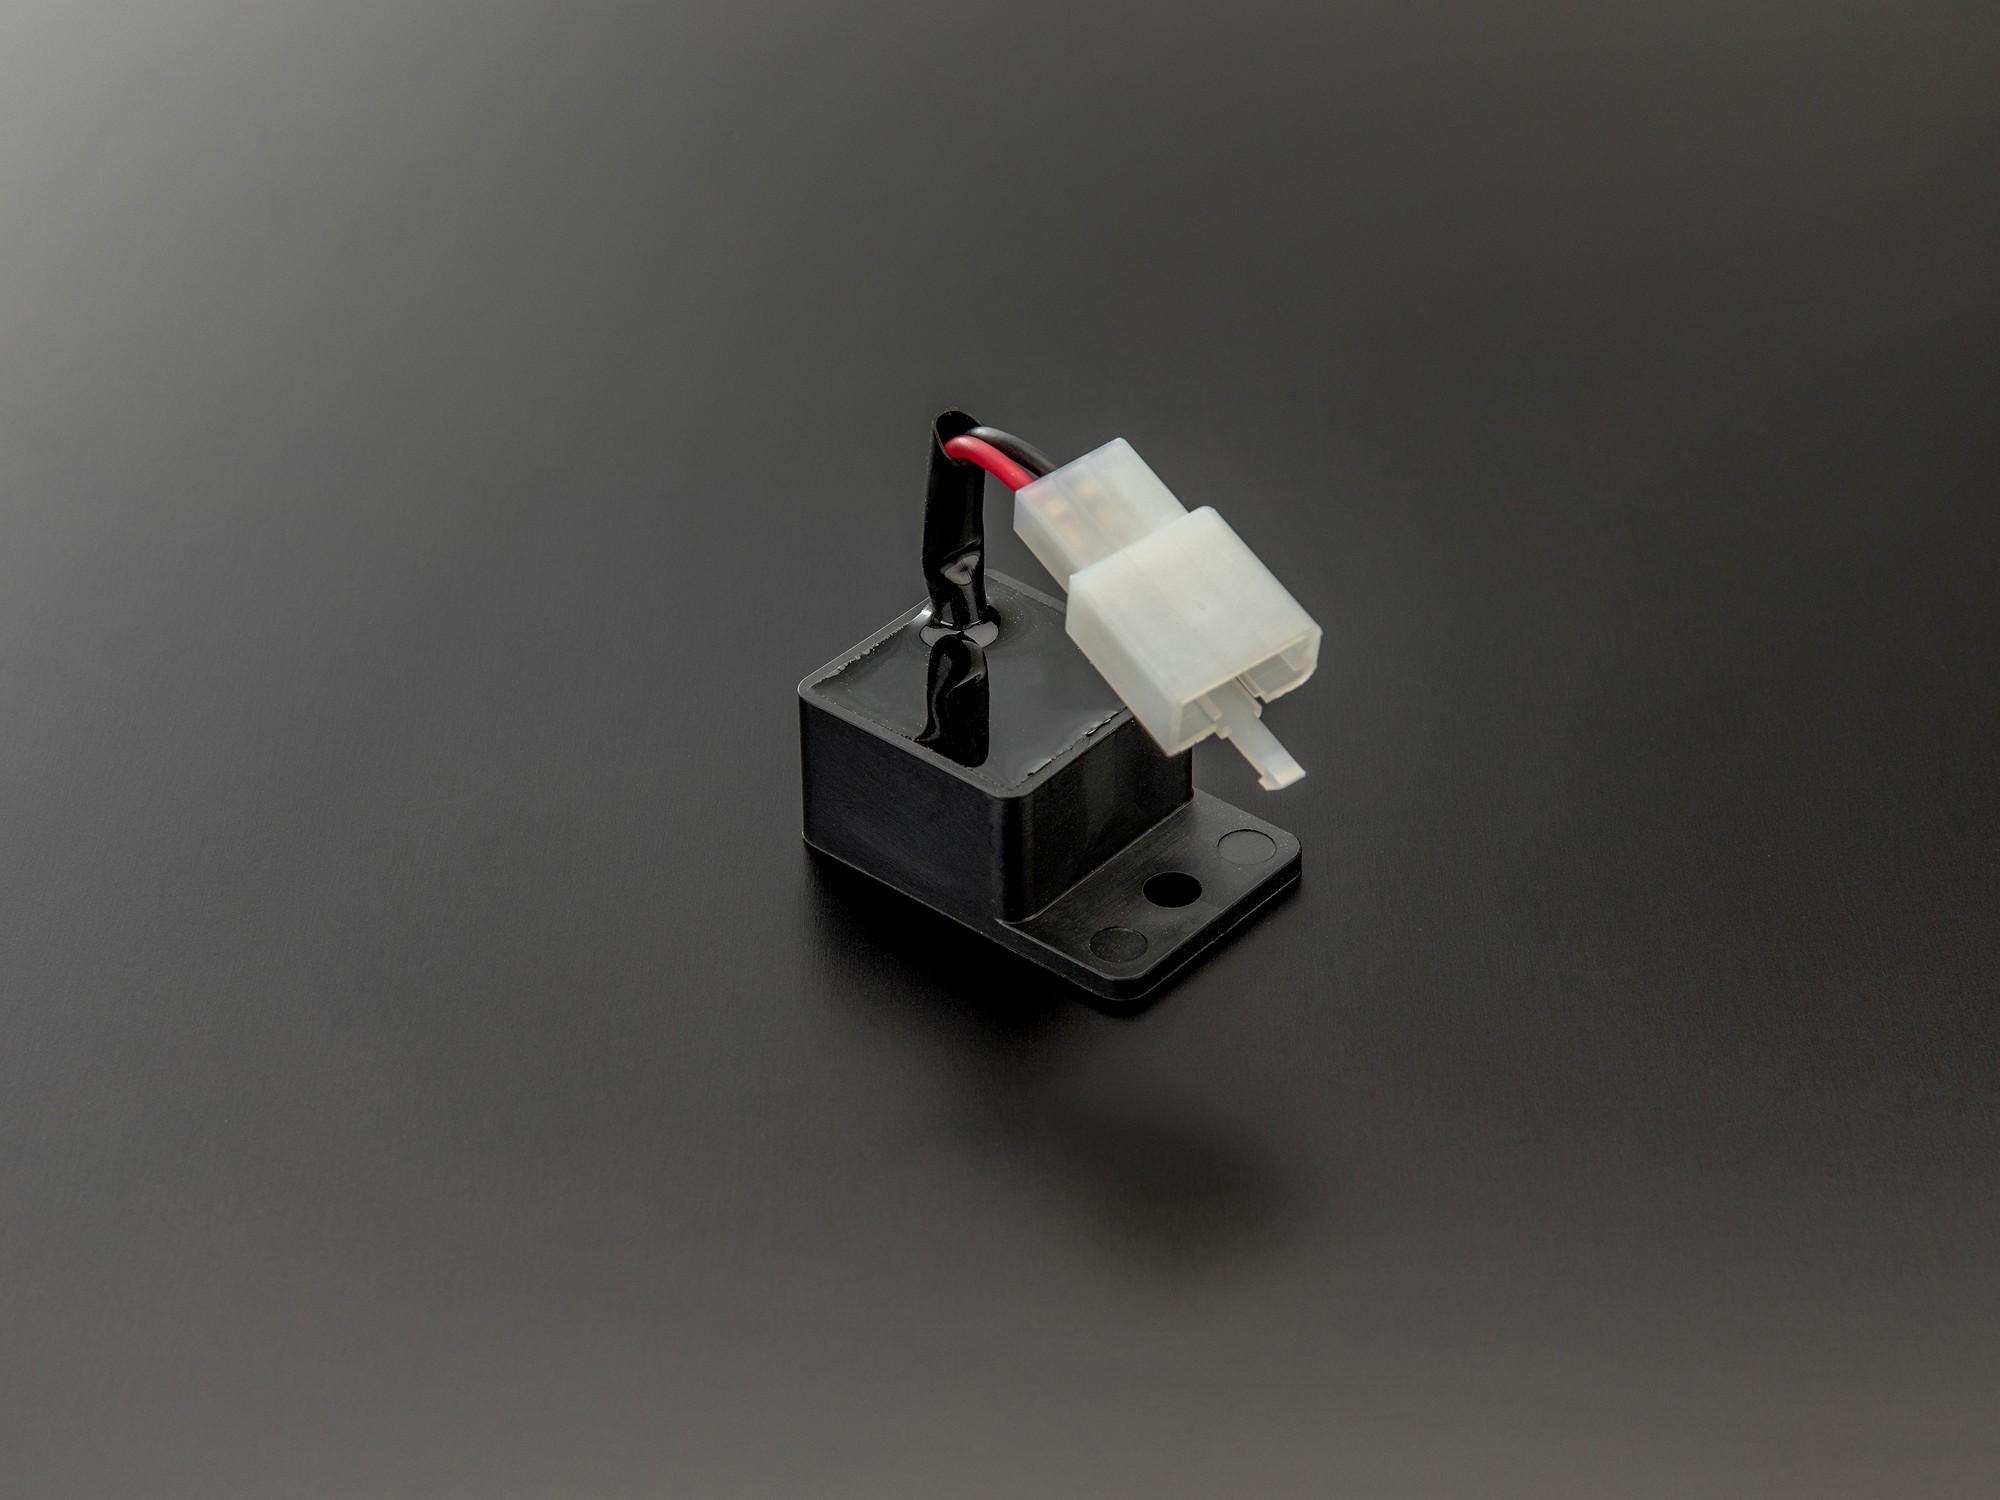 relais f r led blinker honda kawasaki yamaha. Black Bedroom Furniture Sets. Home Design Ideas